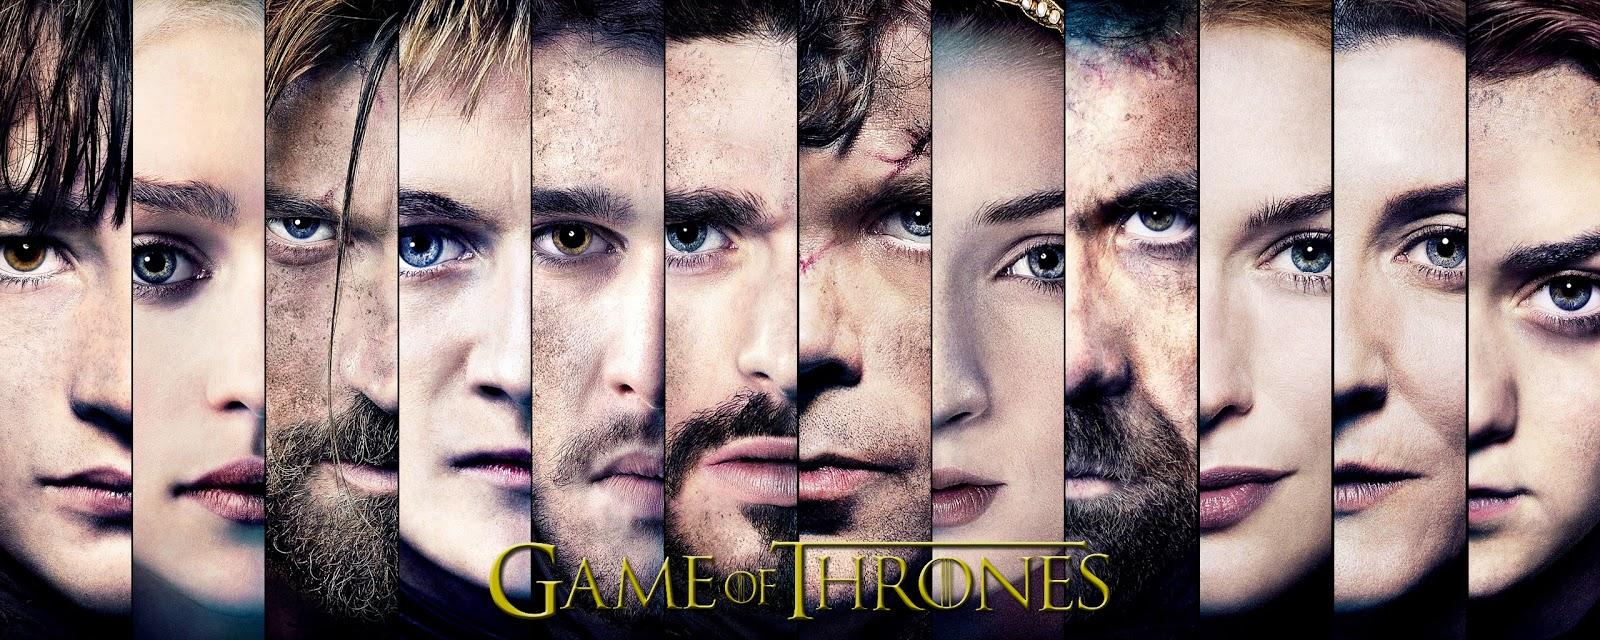 Game of Thrones Season 4 Wallpapers for iPad iPad Mini Tricks 1600x640